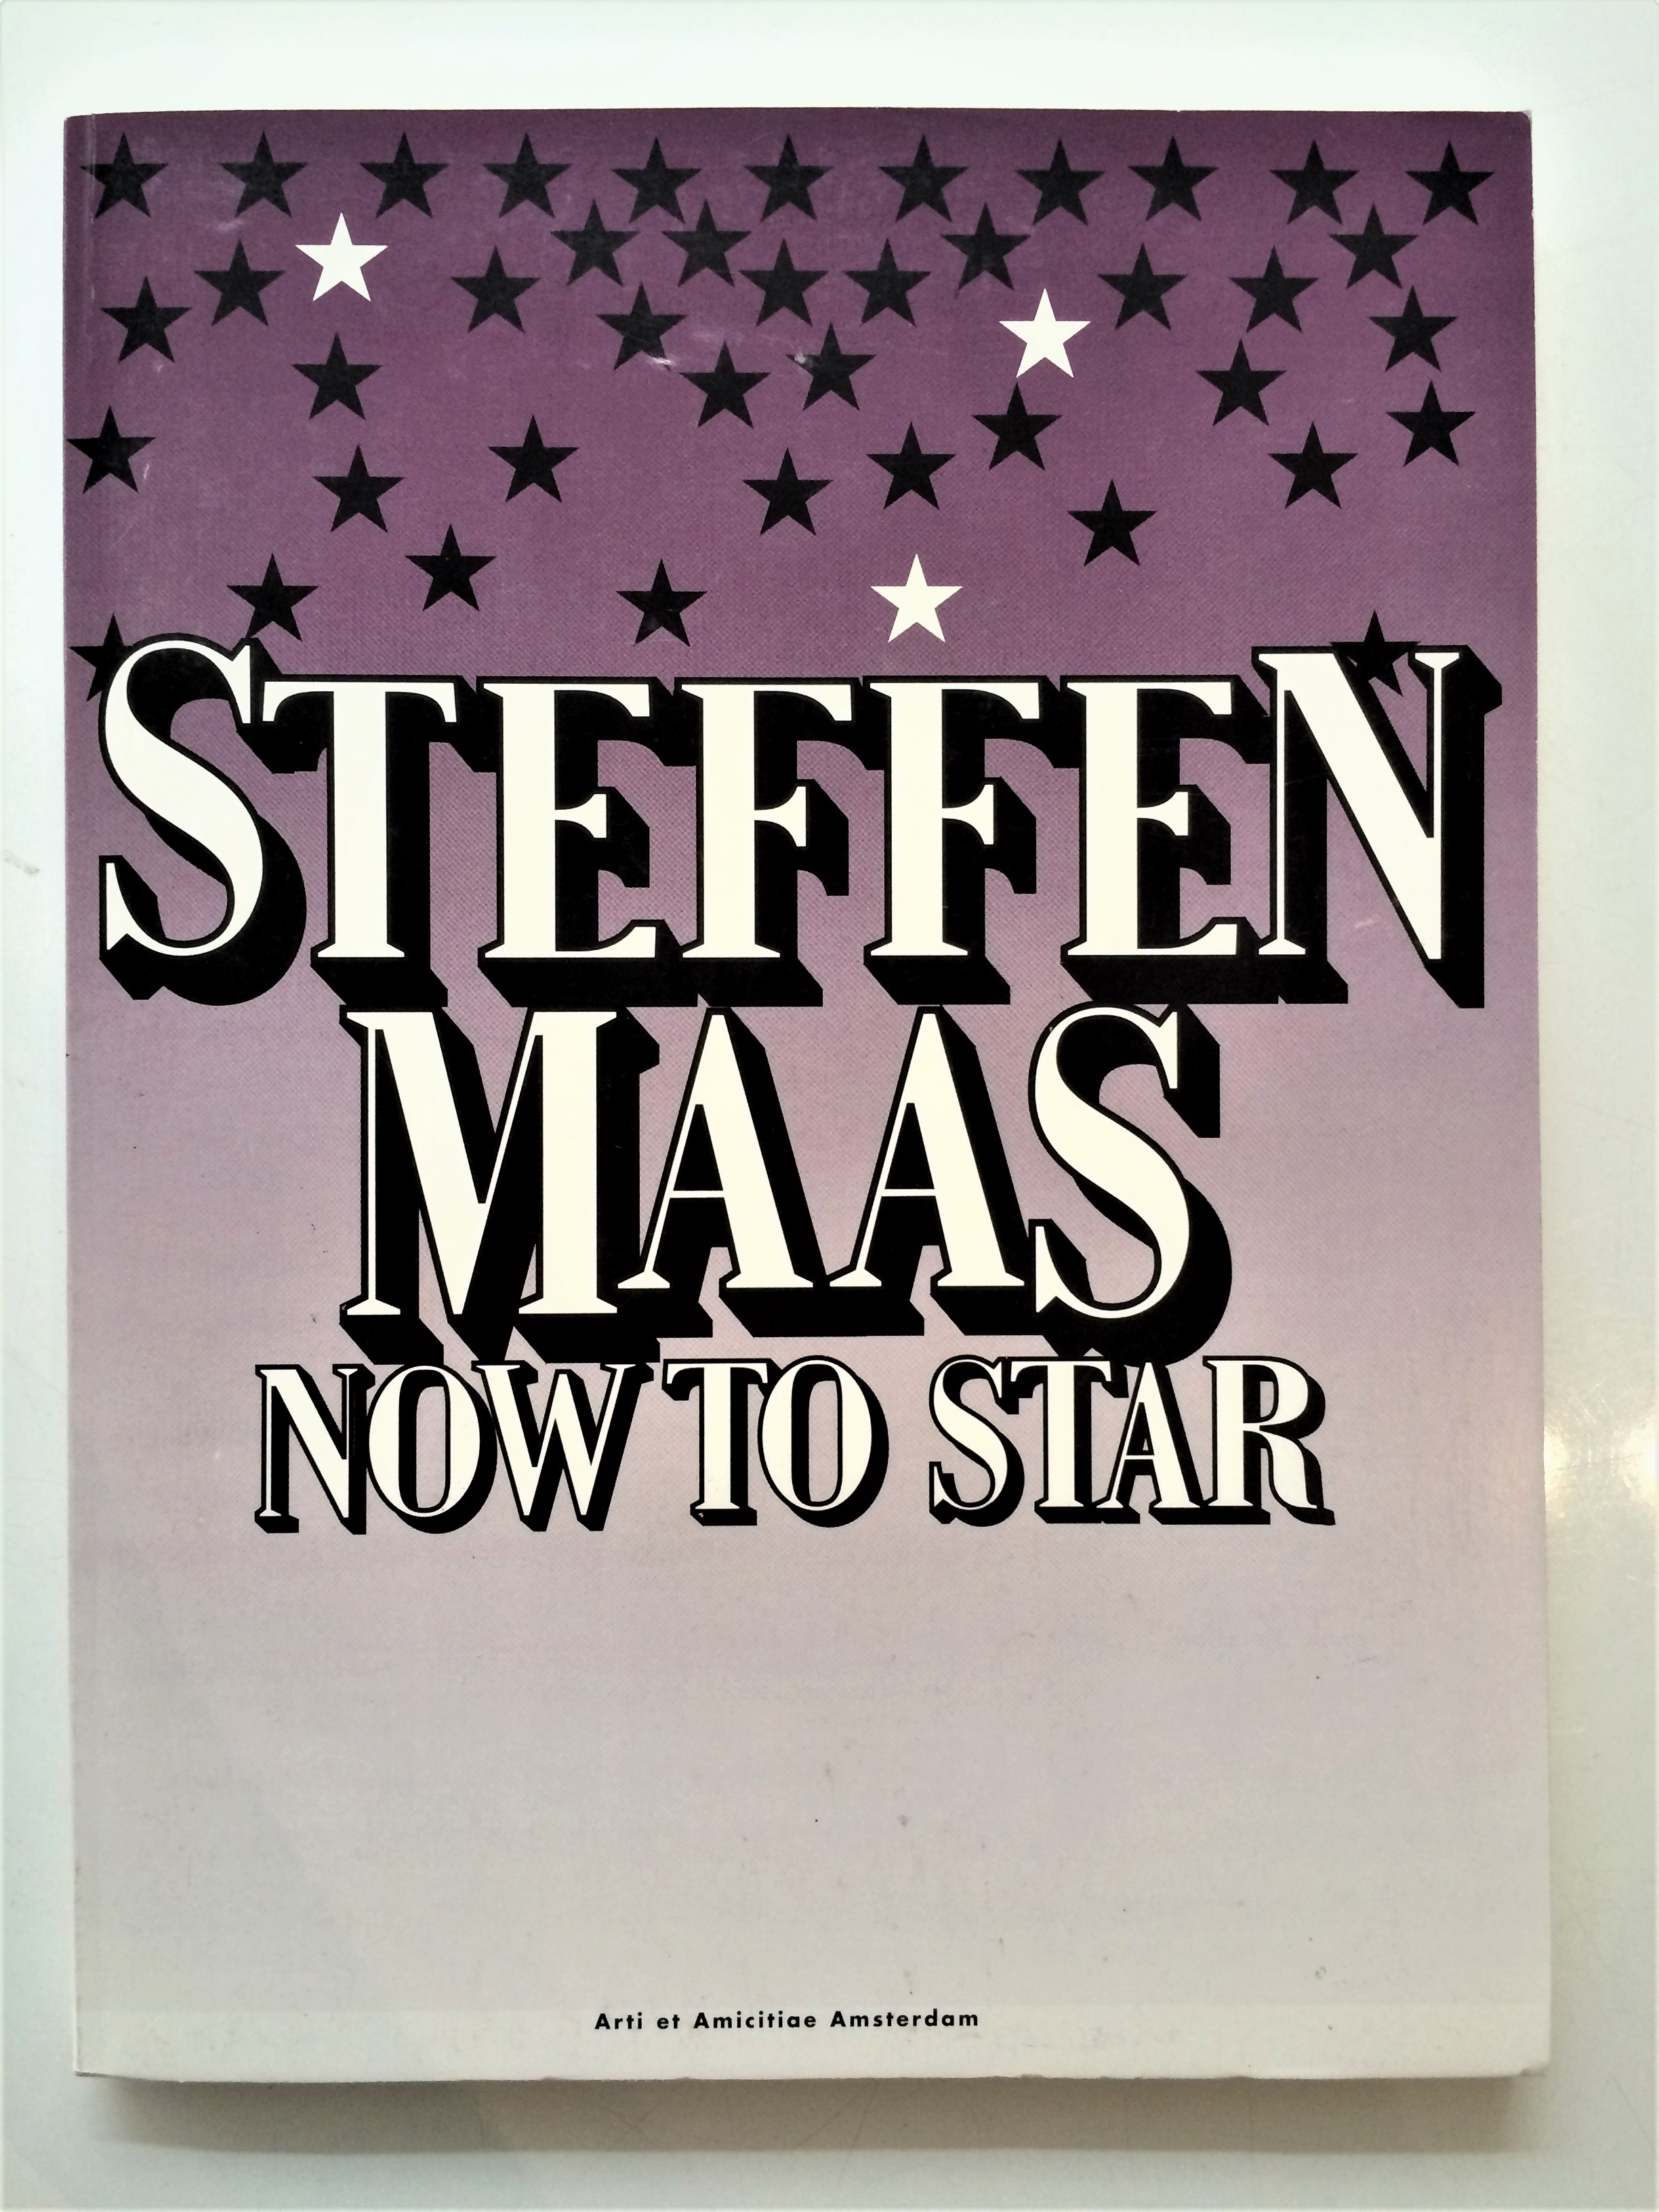 Steffen-Maas-Now-to-star